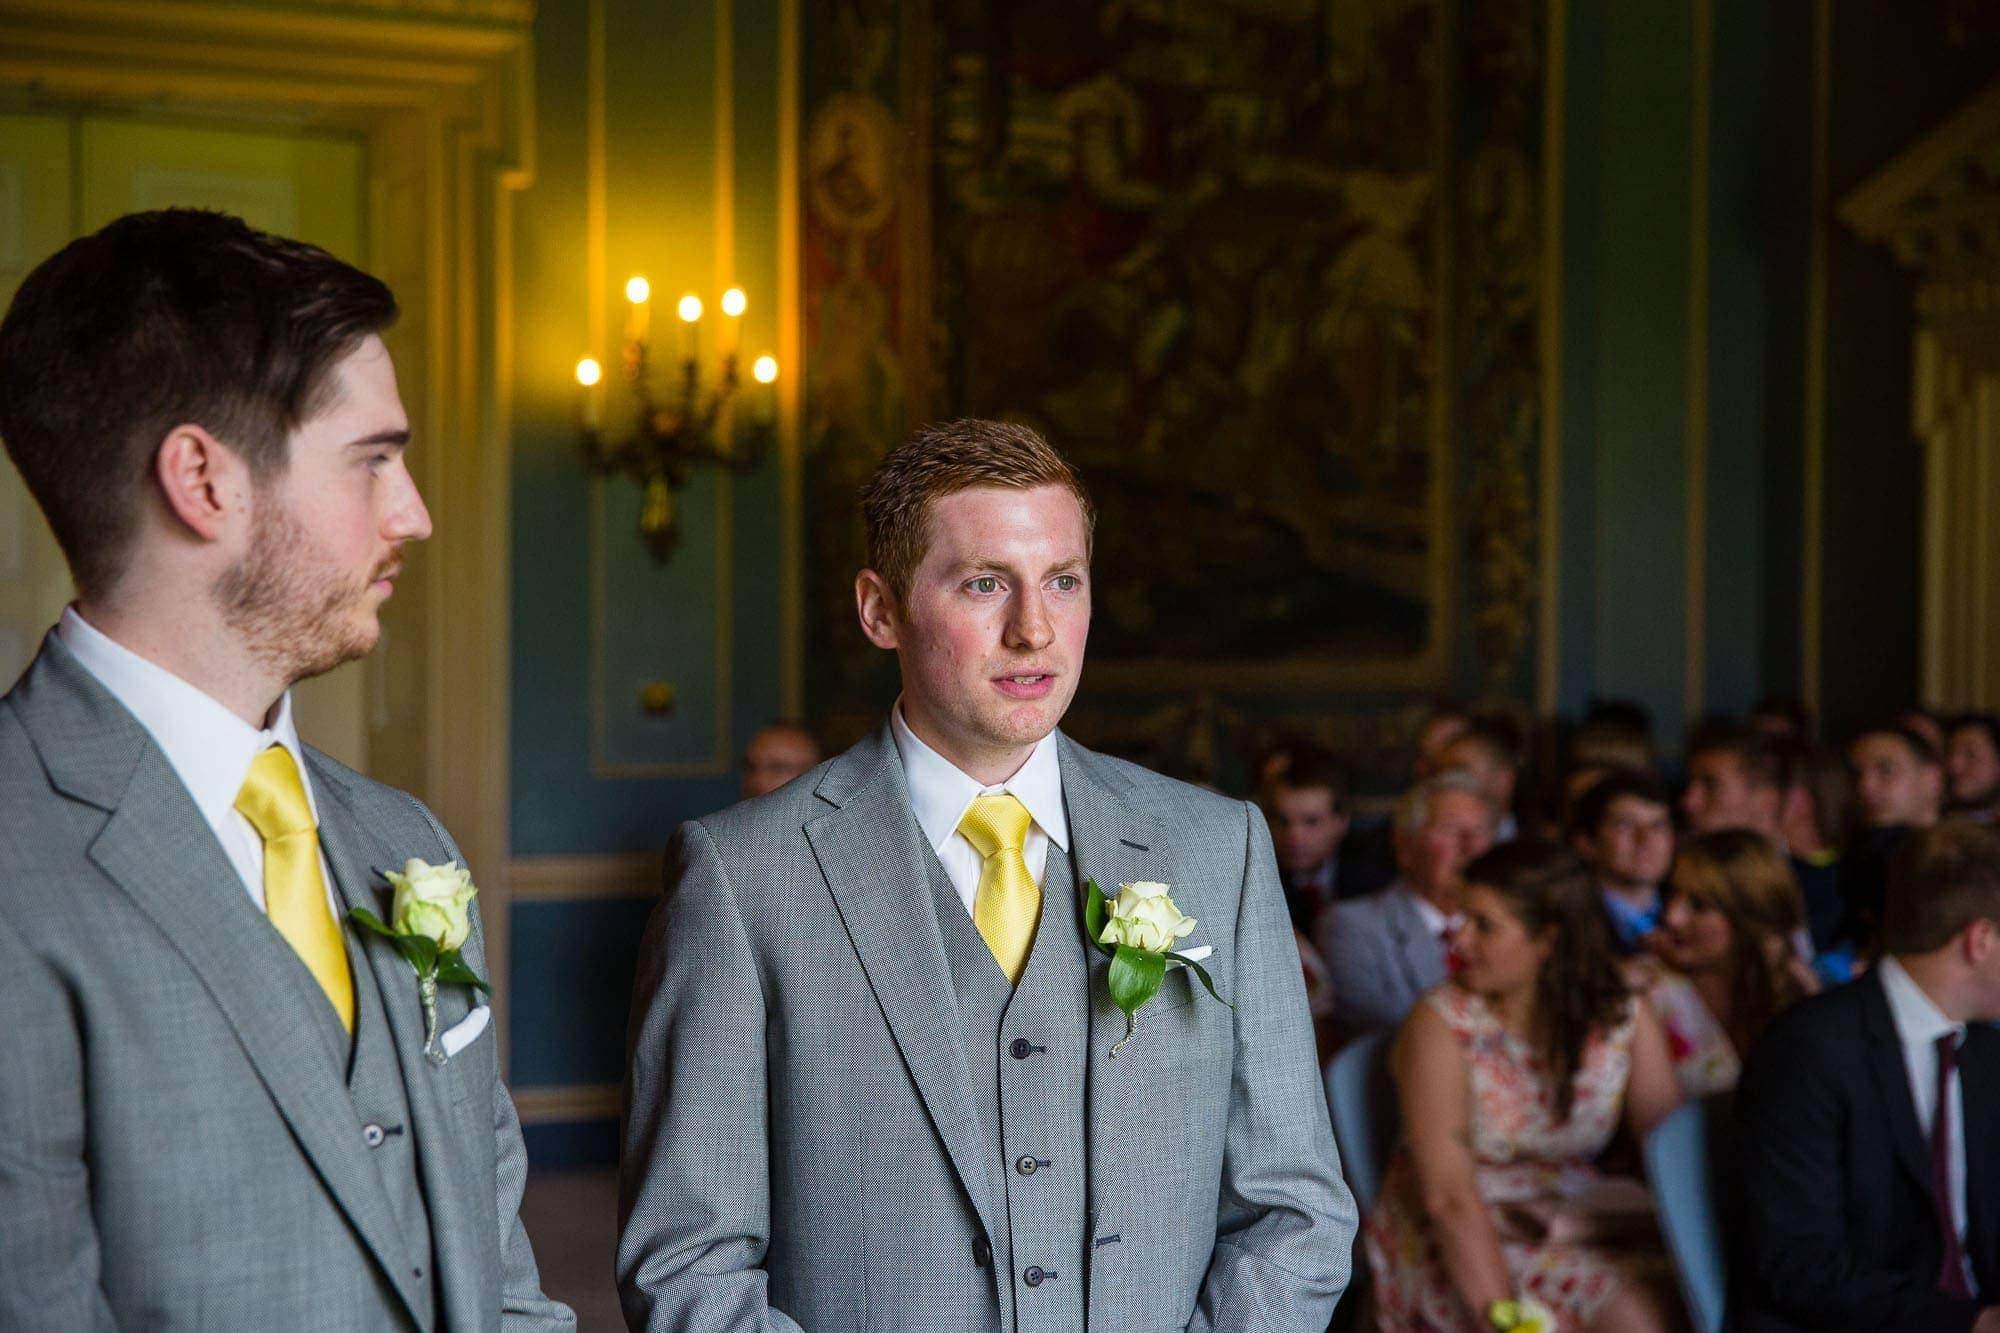 Clandon Park Wedding Photographer 32 5383